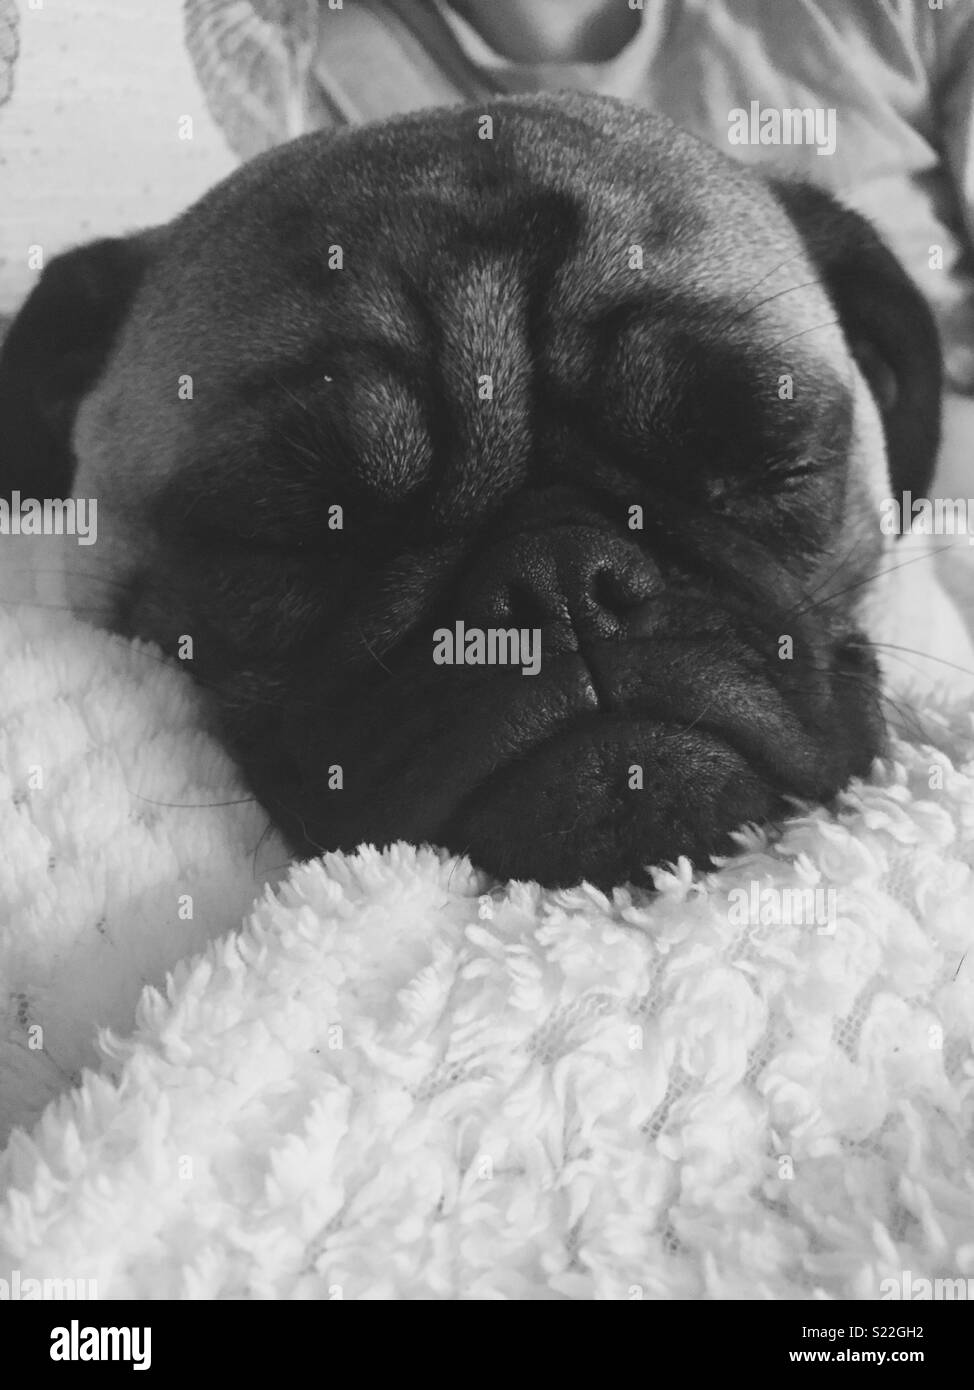 Pug snooze - Stock Image